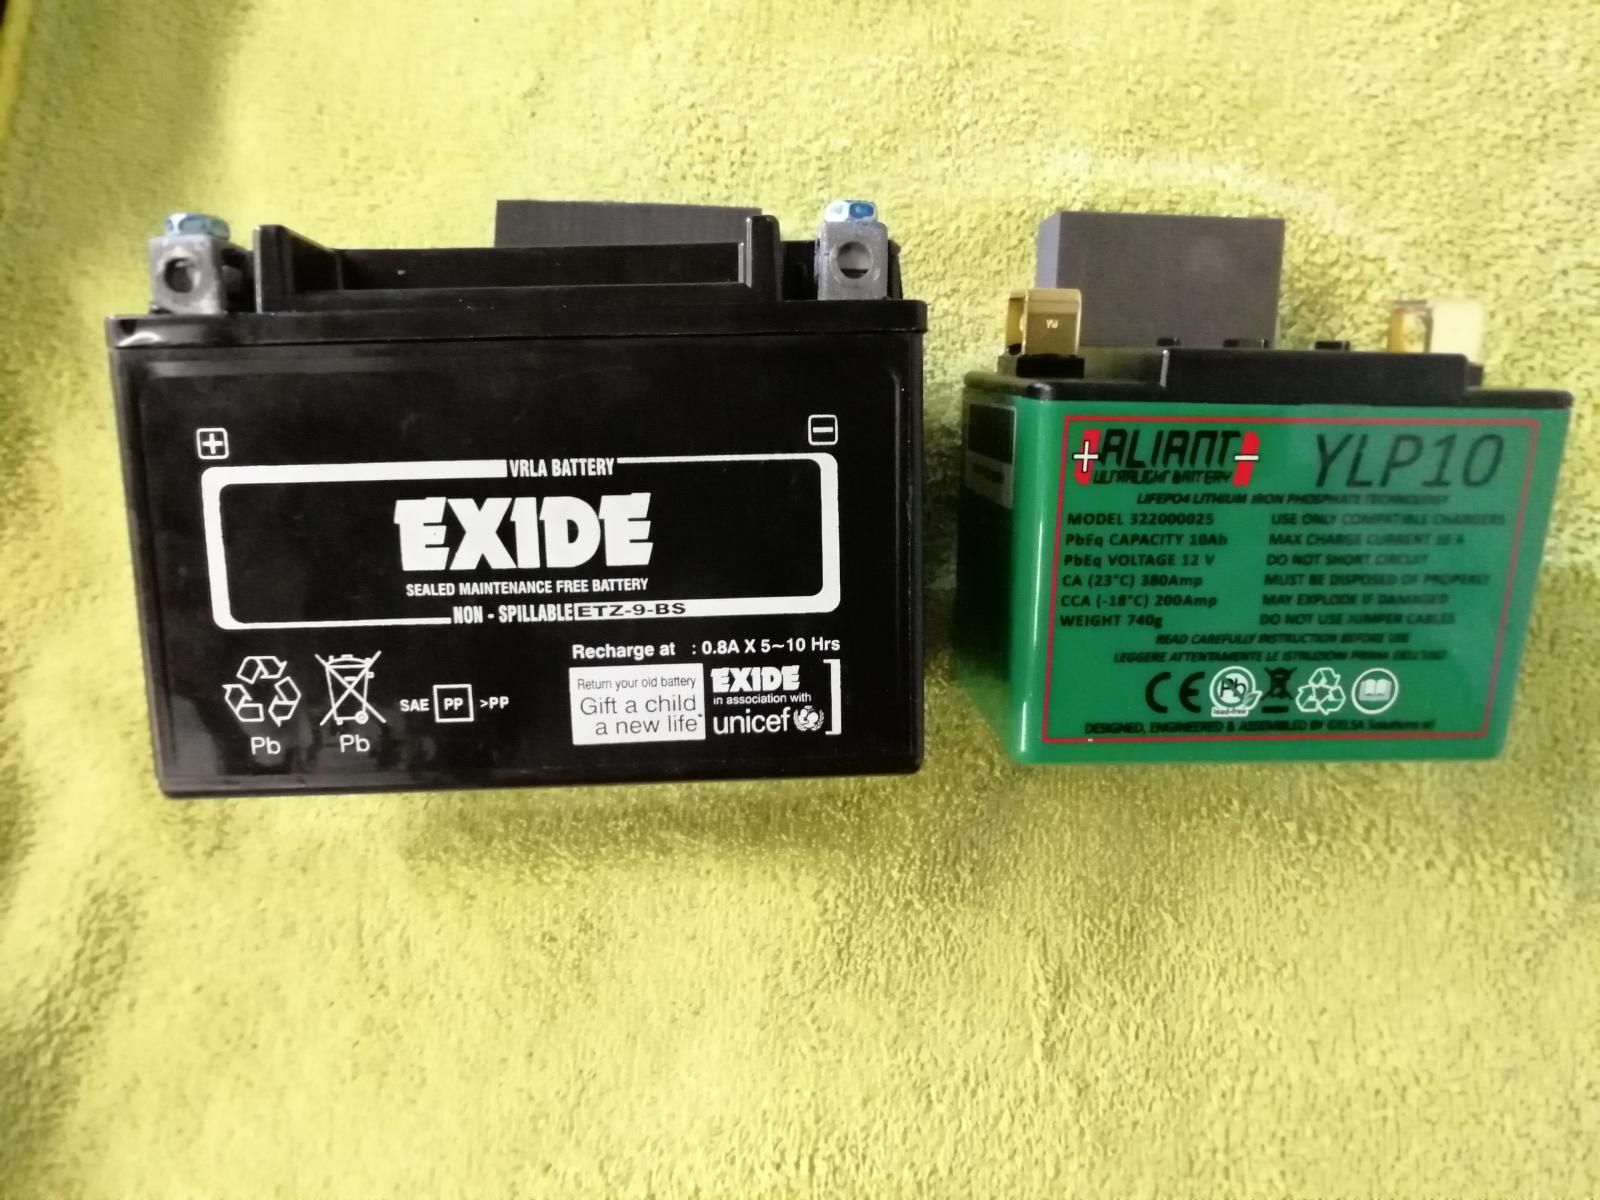 Lightweight battery-img_20190310_145416.jpg